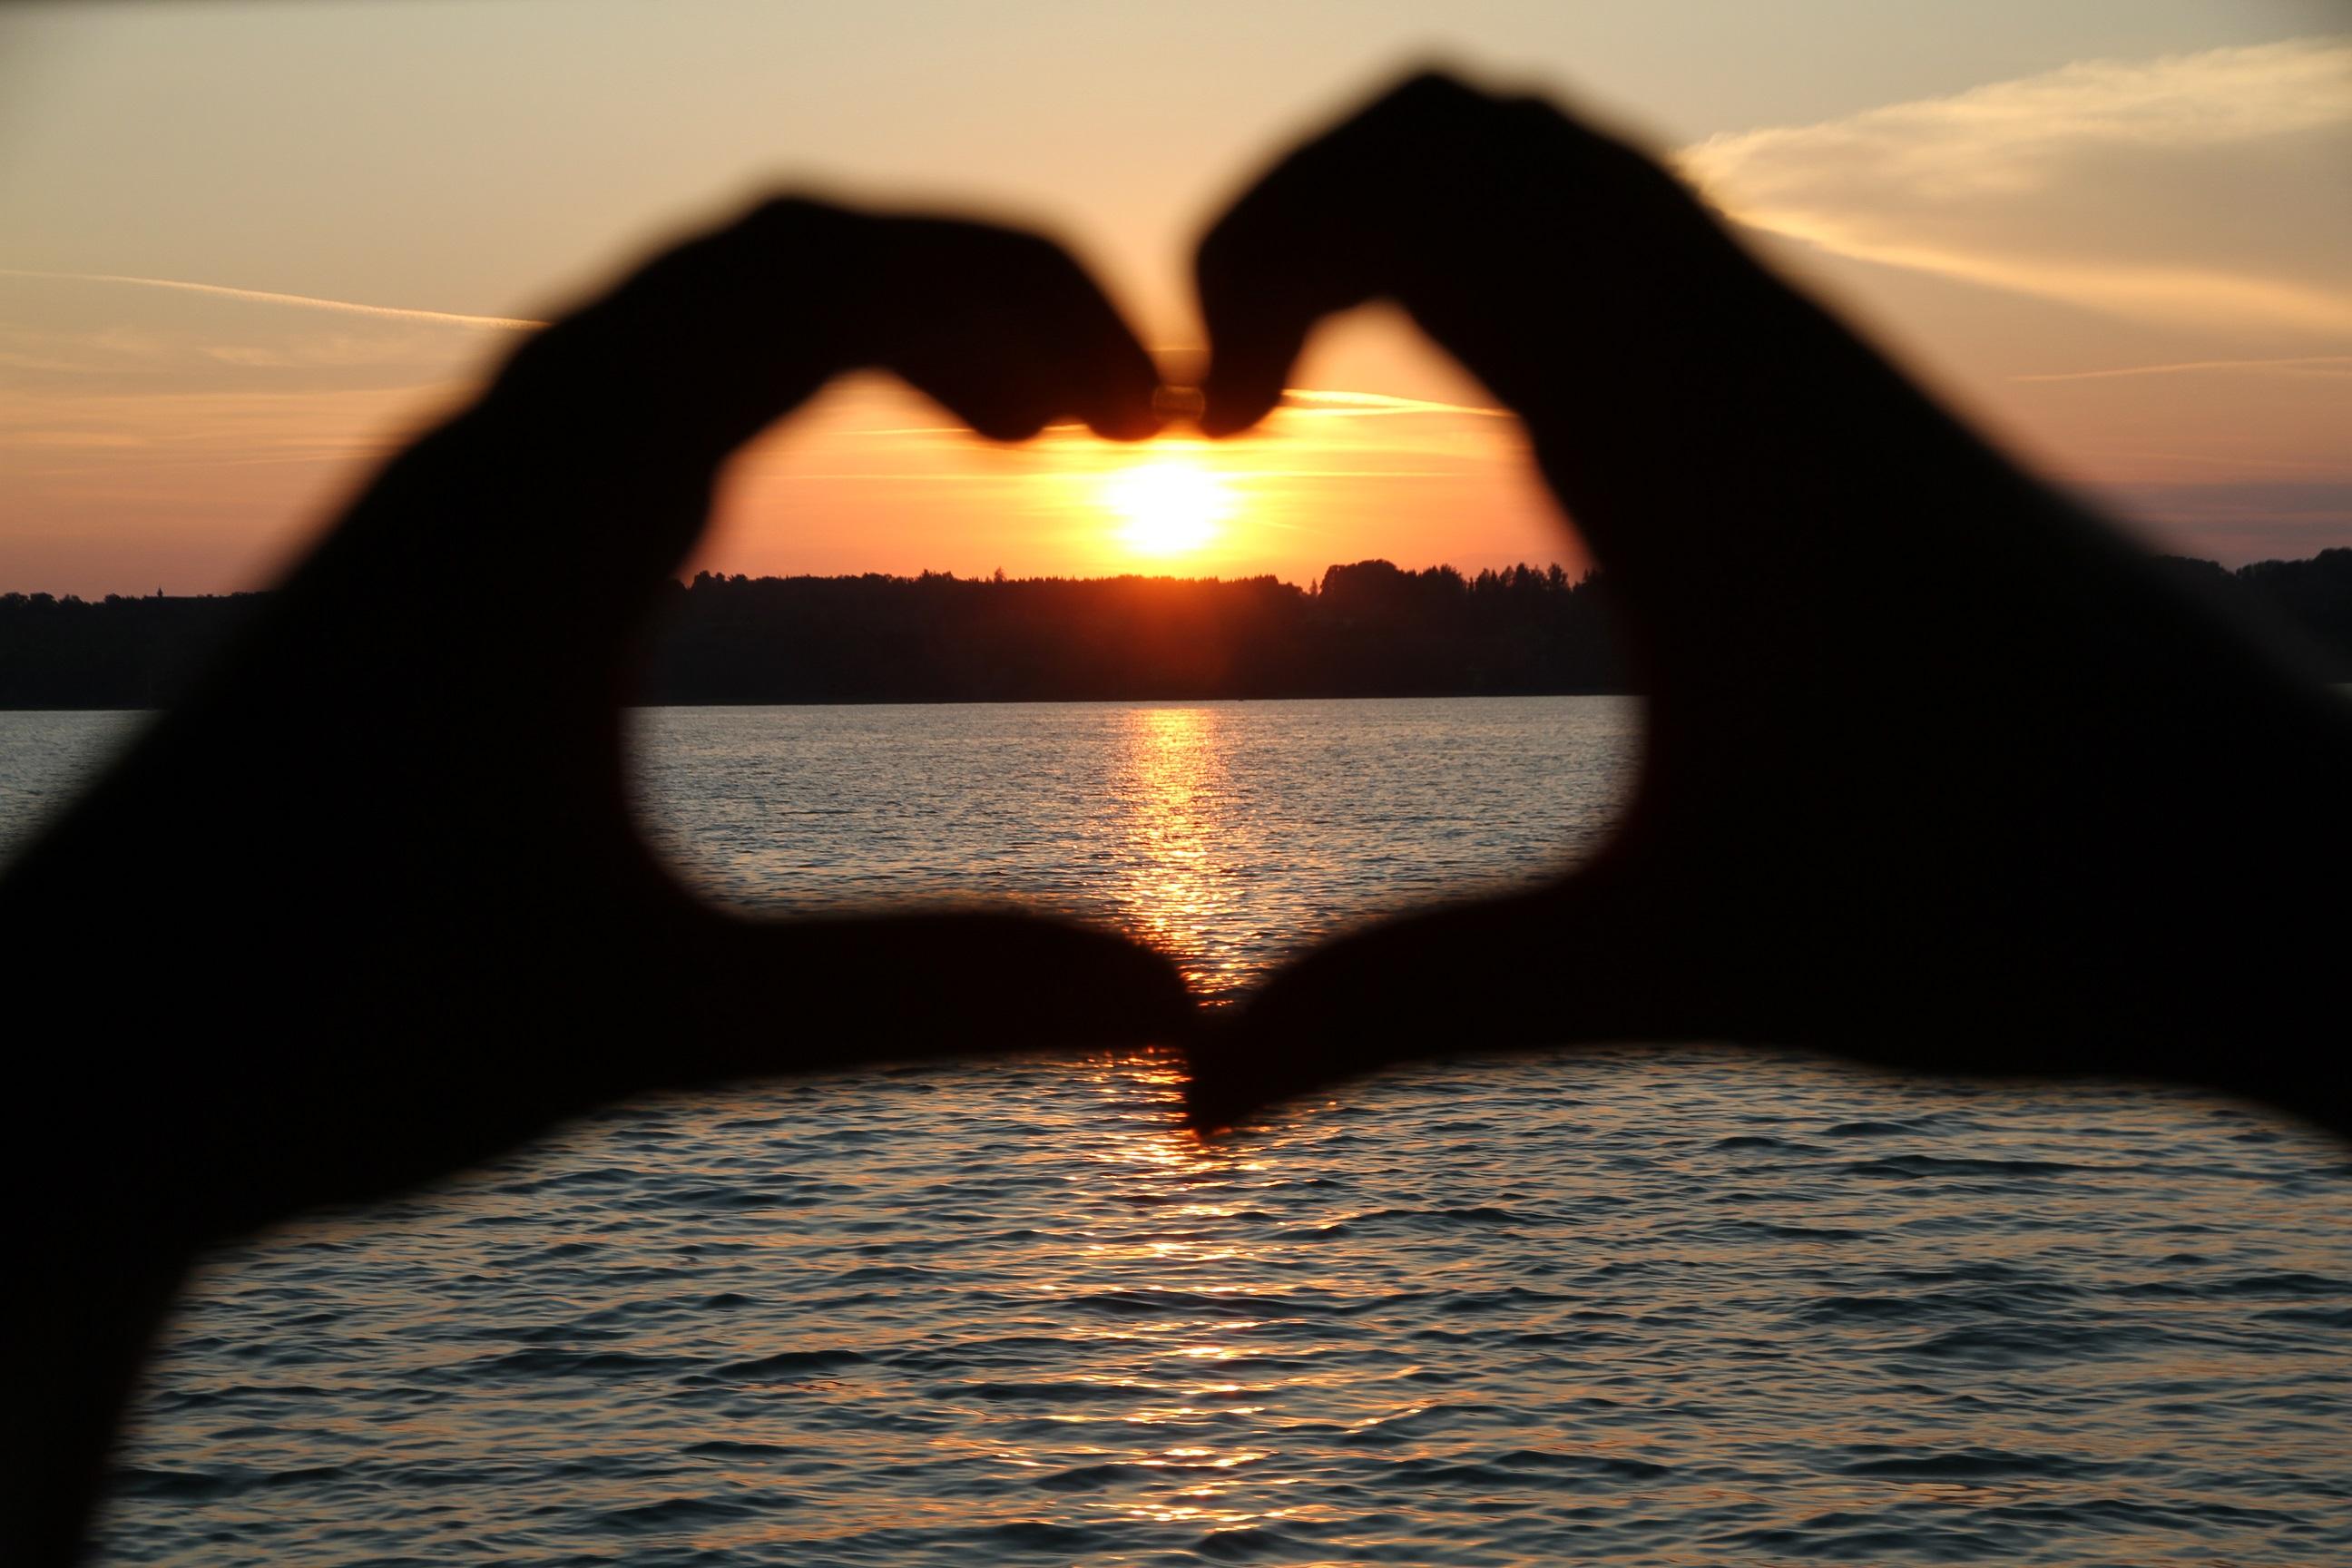 Sonnenuntergang am Tegernsee - Herzfinger